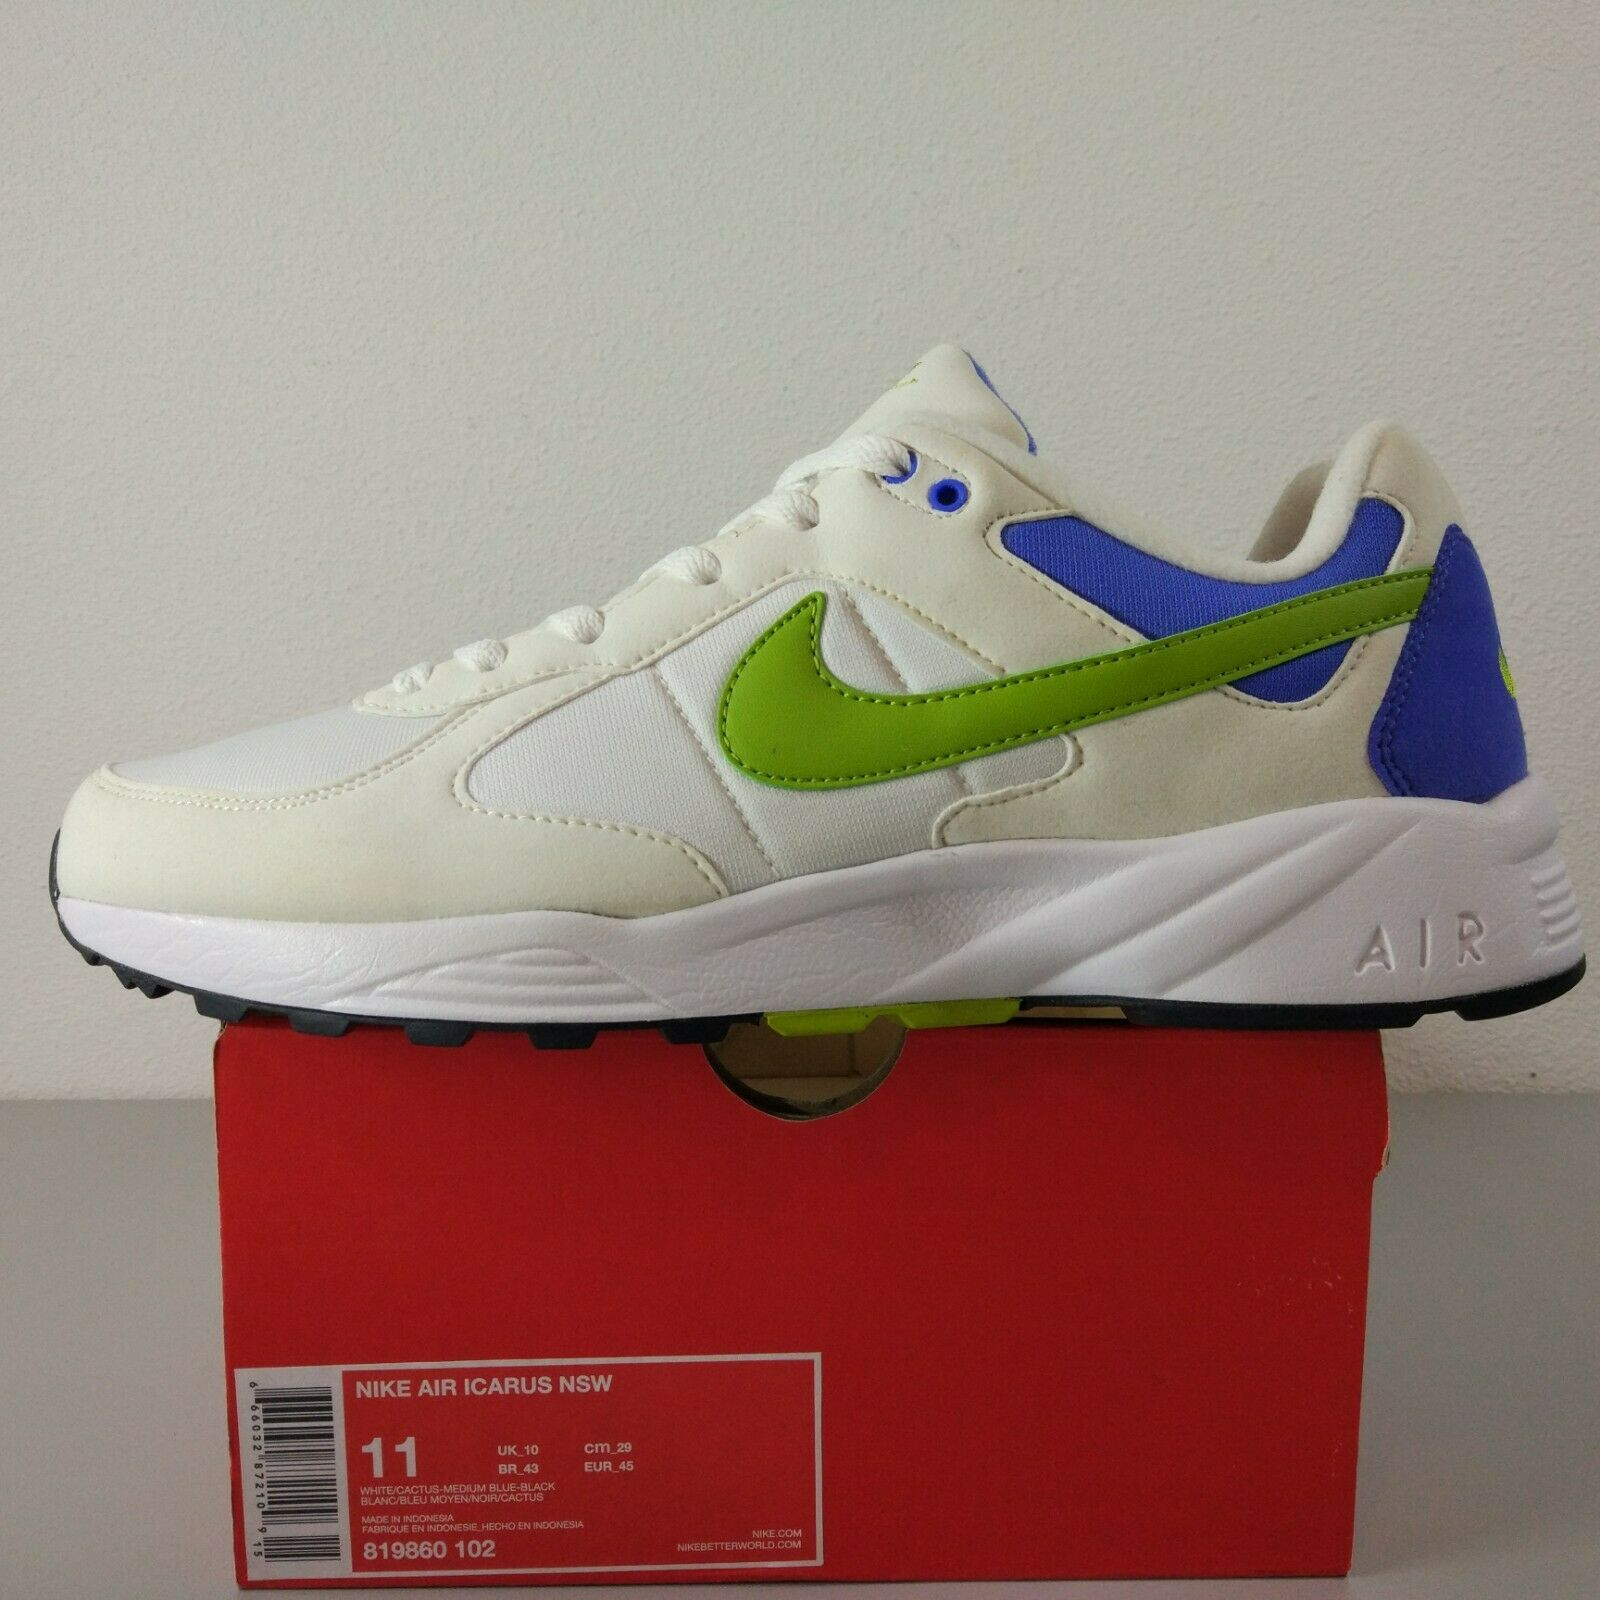 on sale d69b6 ed120 Nike Air Icarus '91 US 11 UK 10 Eur Vintage OG Max Span Base 90 45 ...